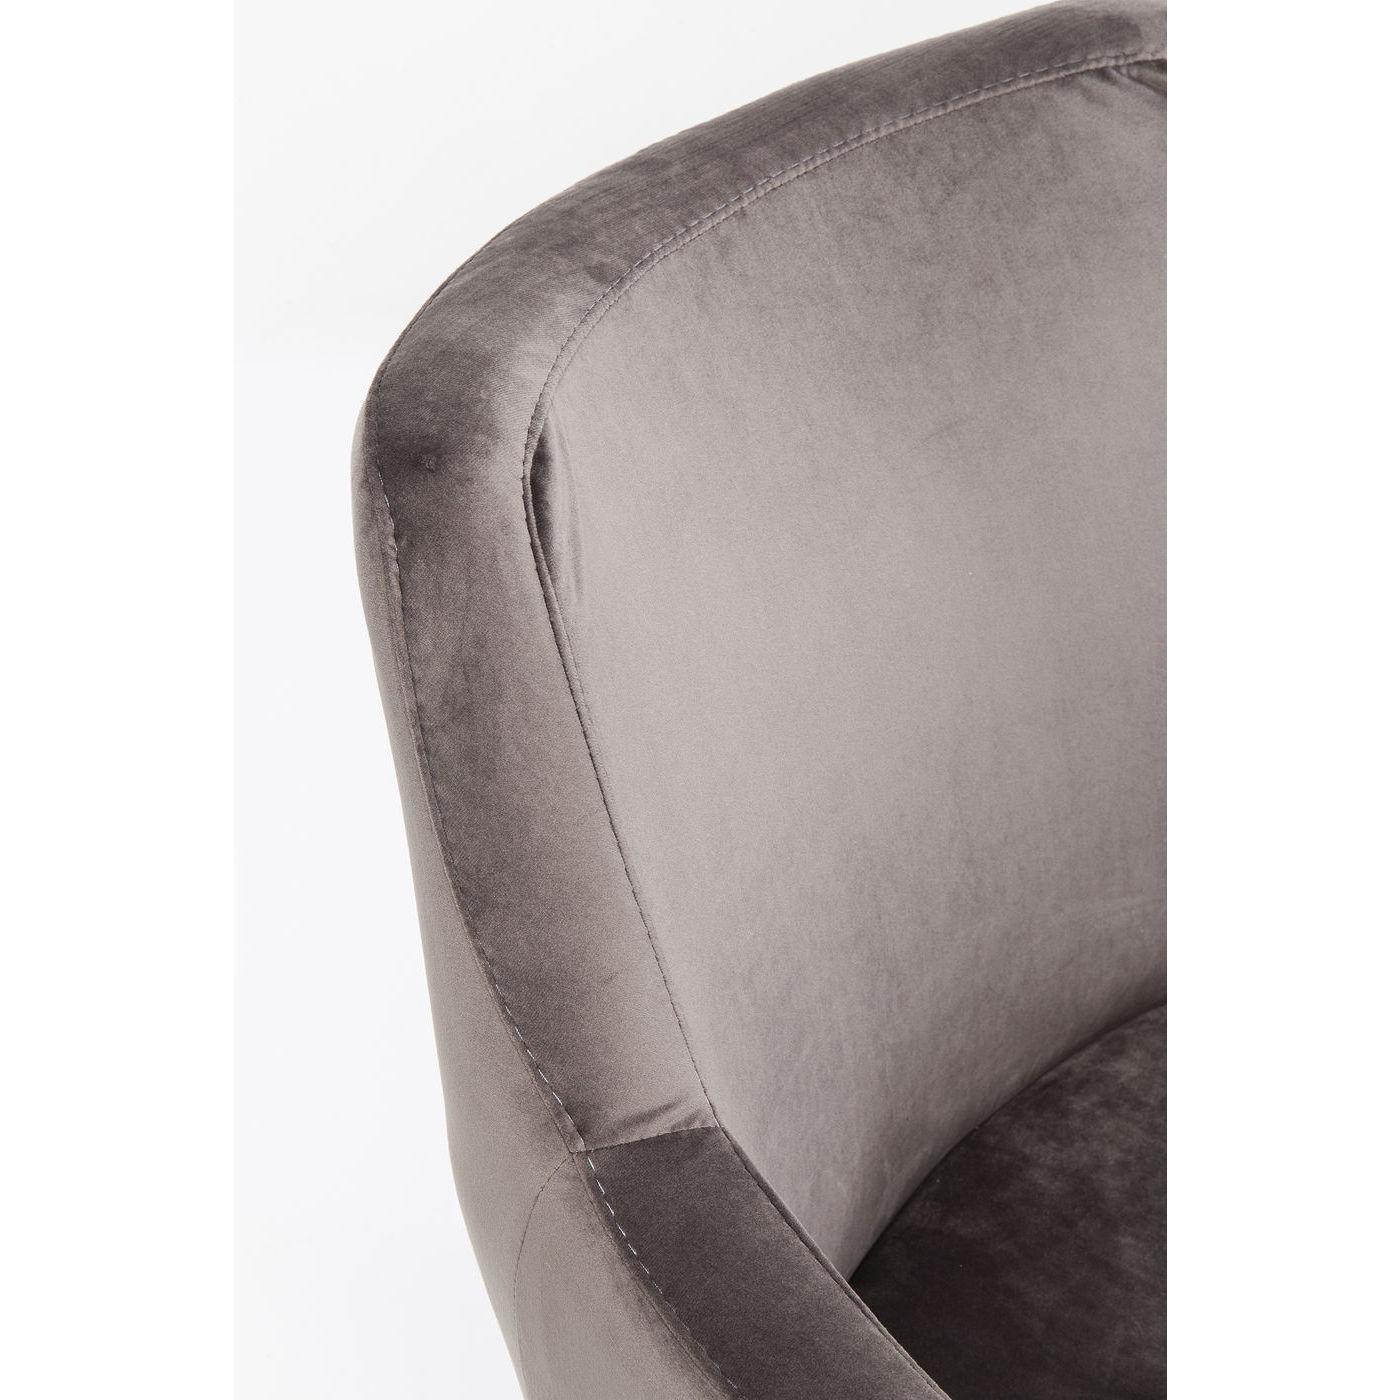 Chaise avec accoudoirs Mode pieds noirs velours gris Kare Design